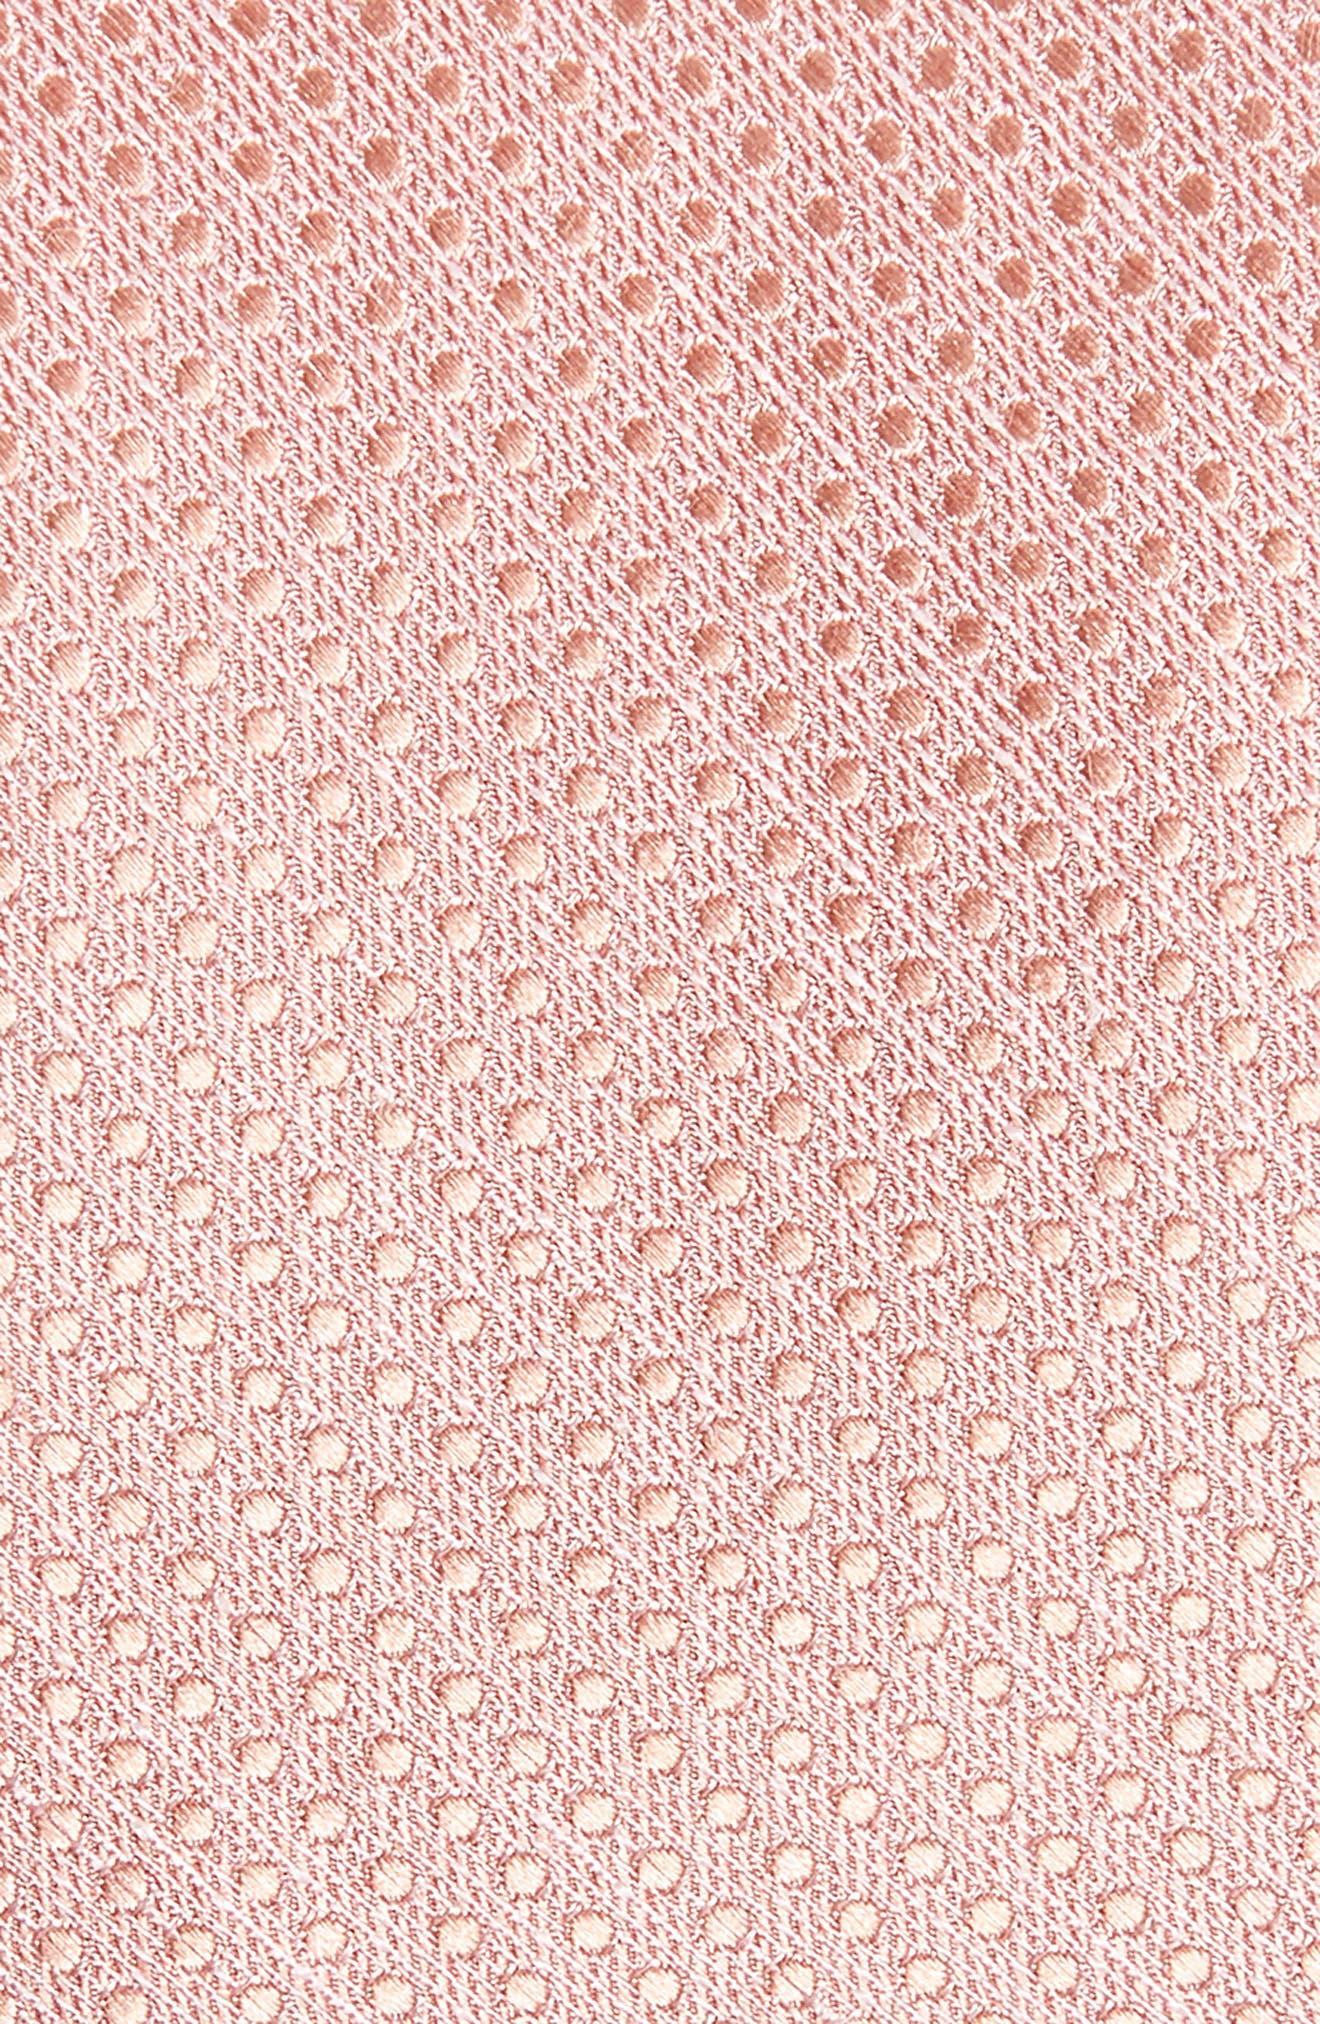 Dotten Dot Silk & Cotton Tie,                             Alternate thumbnail 6, color,